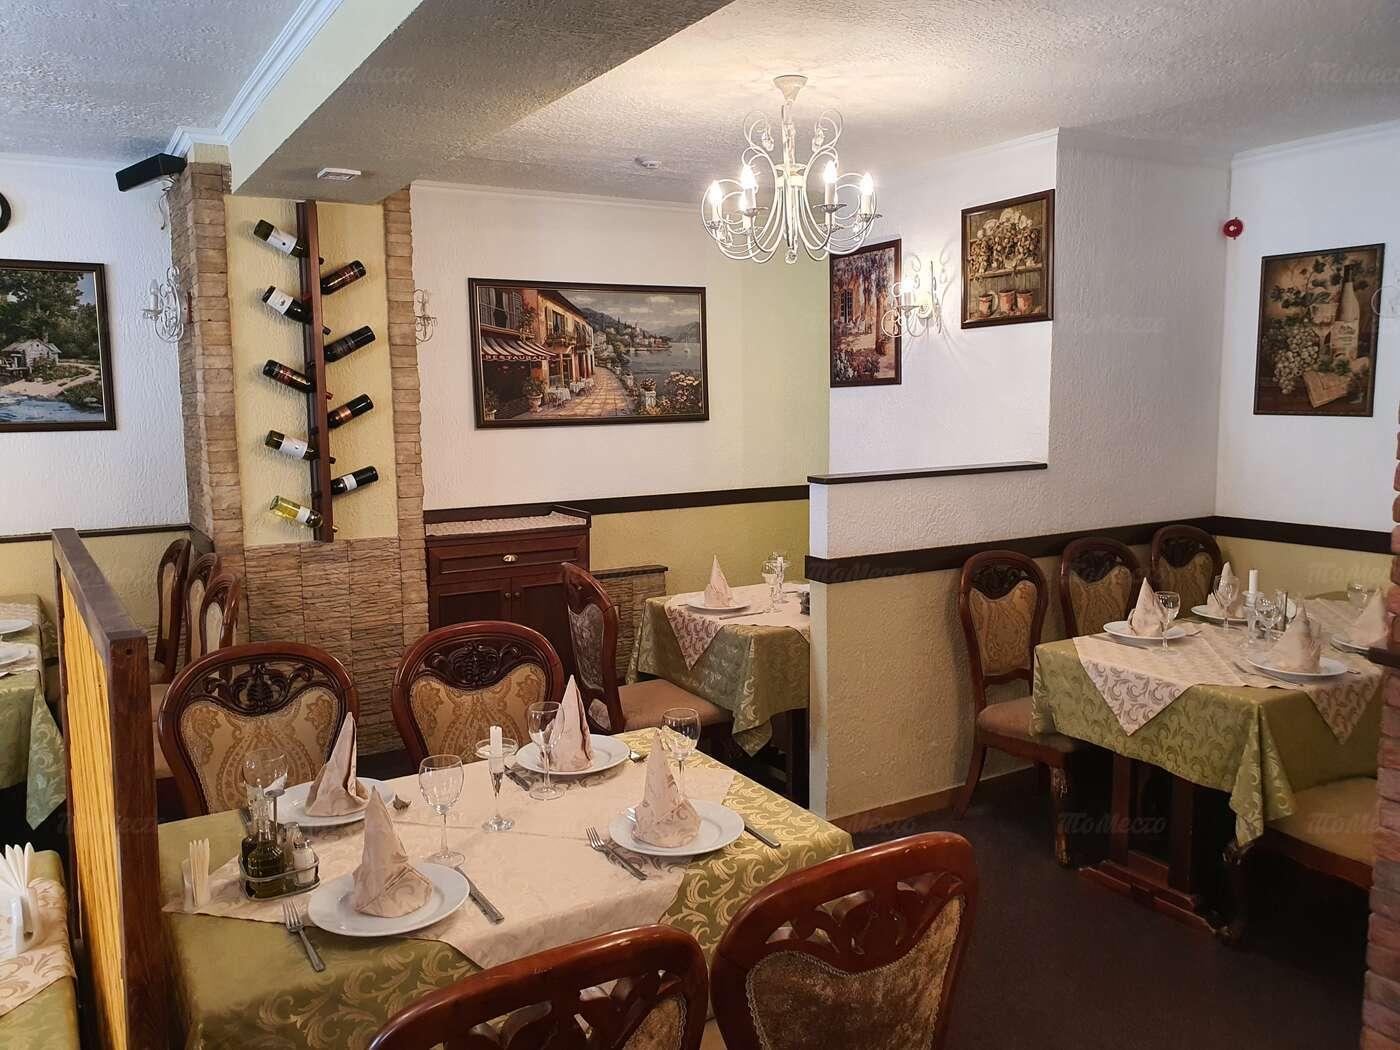 Ресторан Балканский Гурман на Декабристов